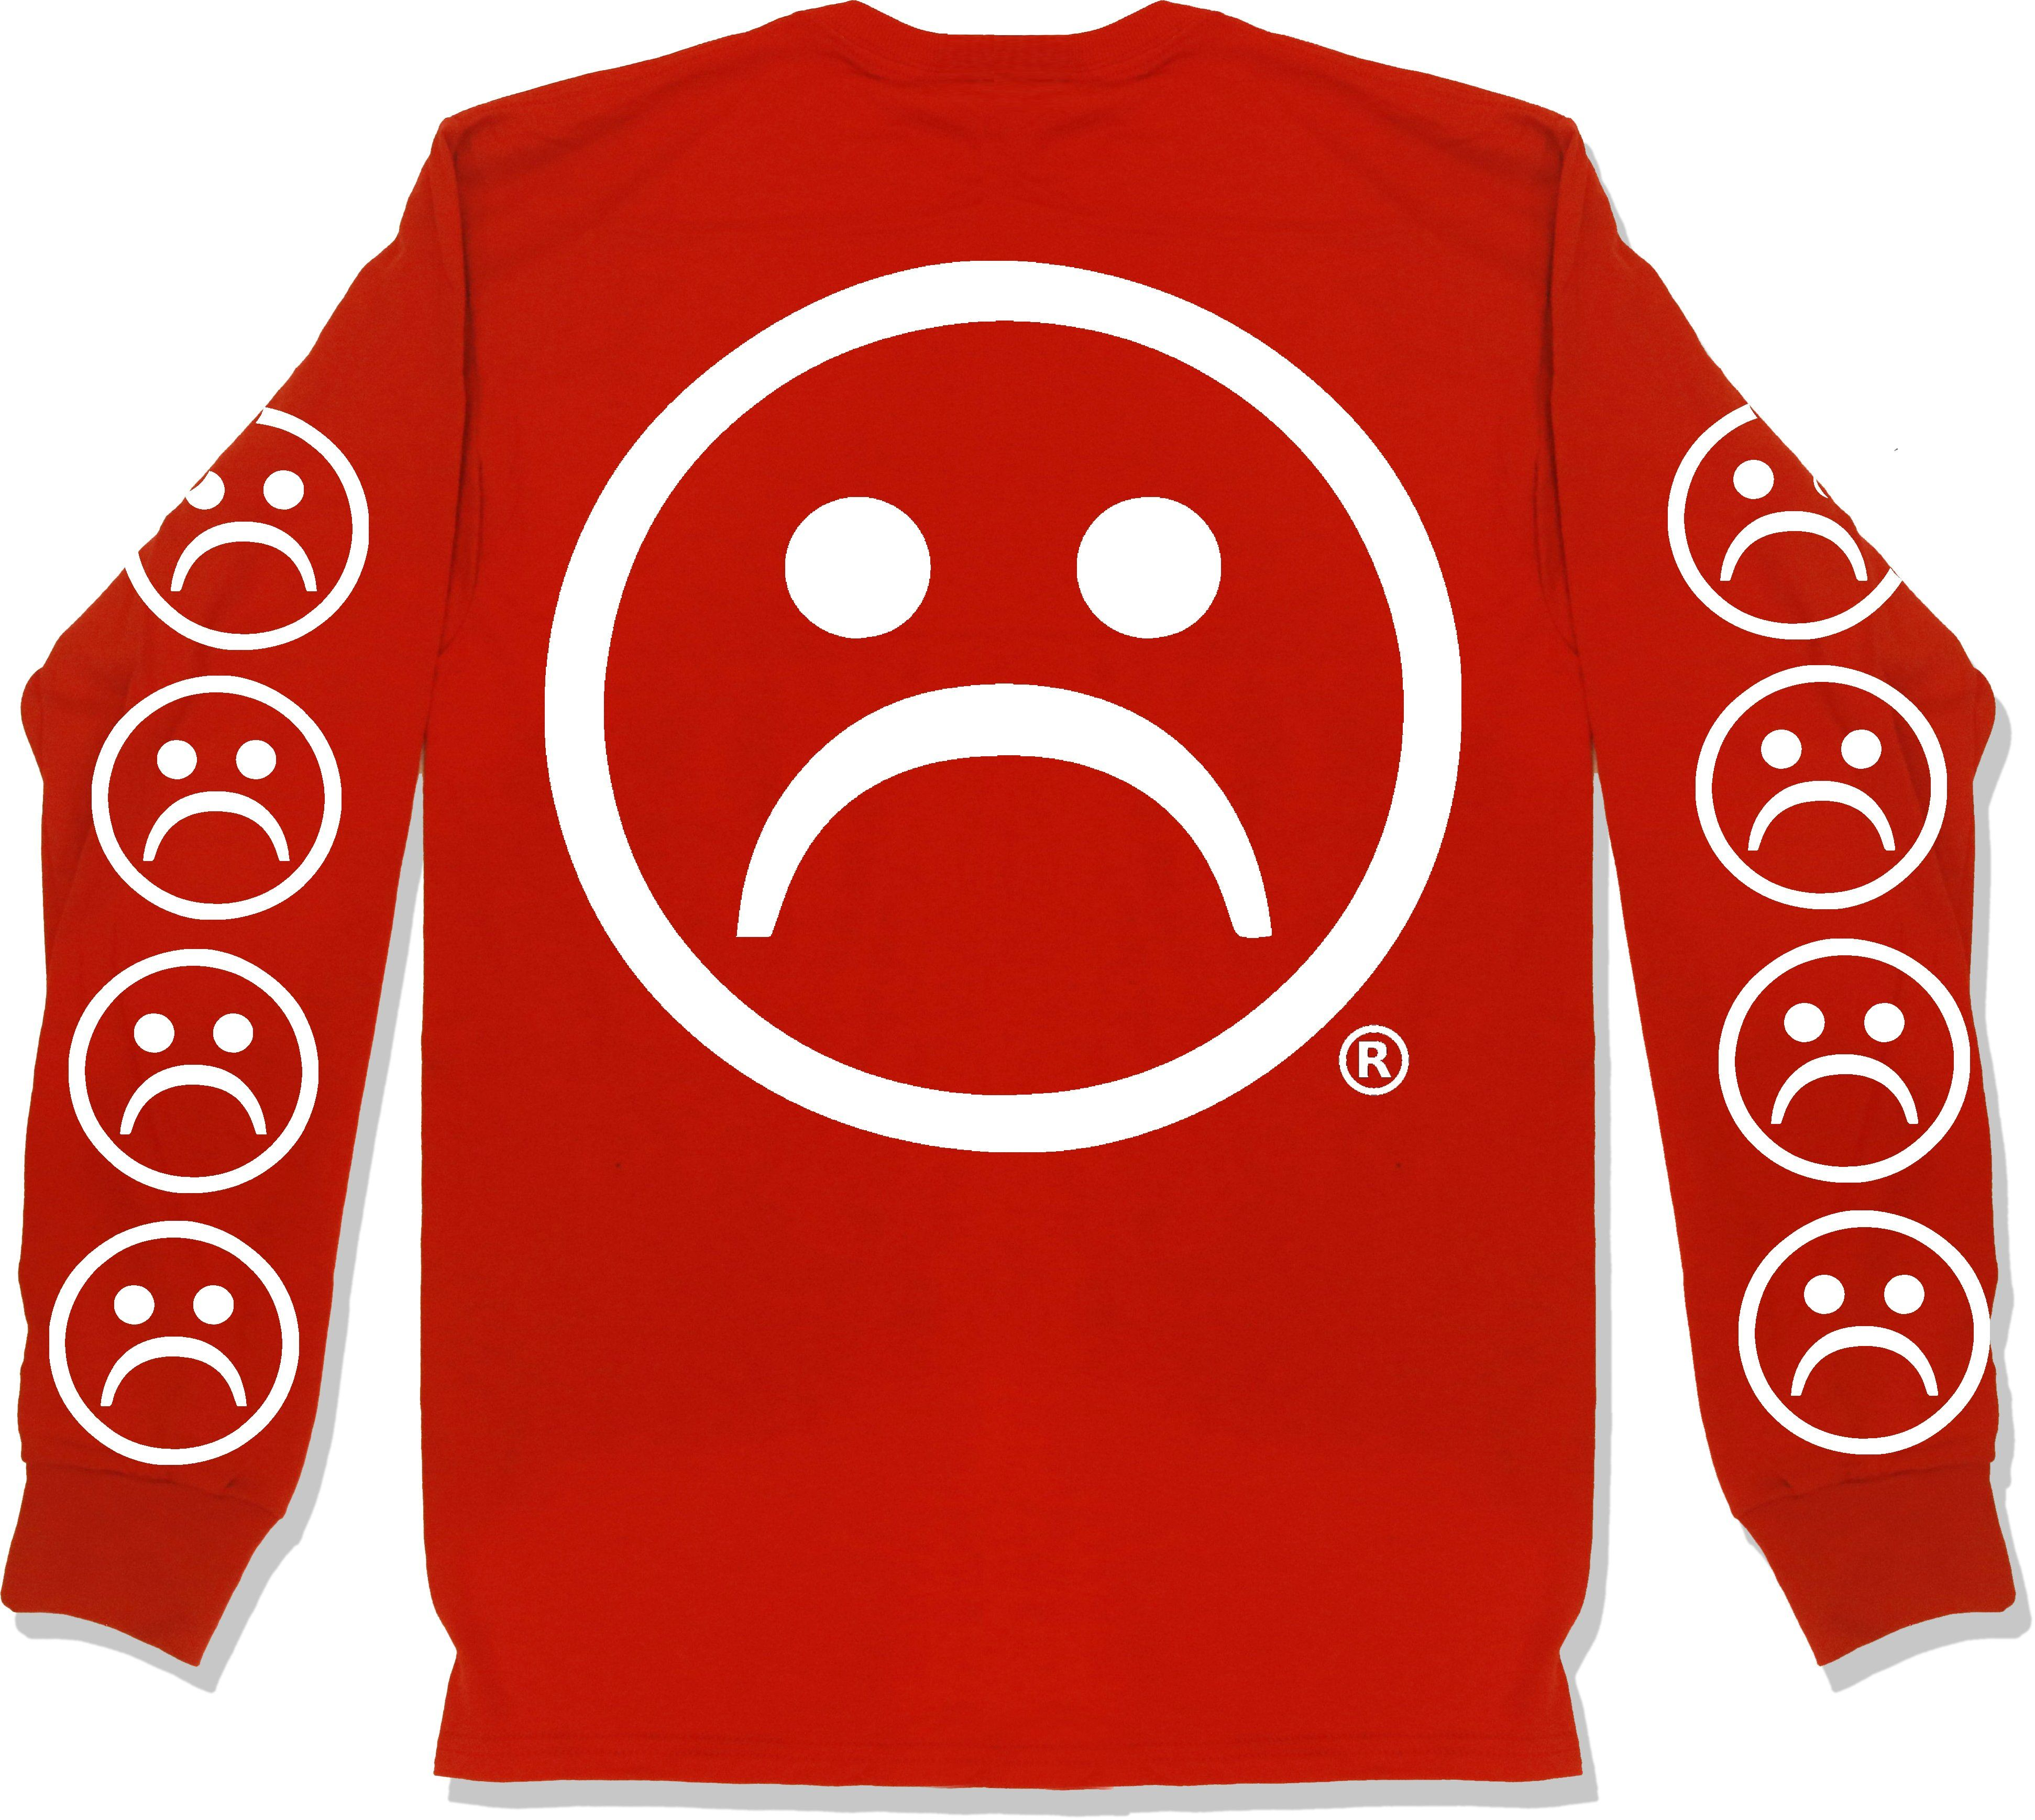 cb22dfba5840 The Sad Society™ Sad Face™ Red Long Sleeve T Shirt